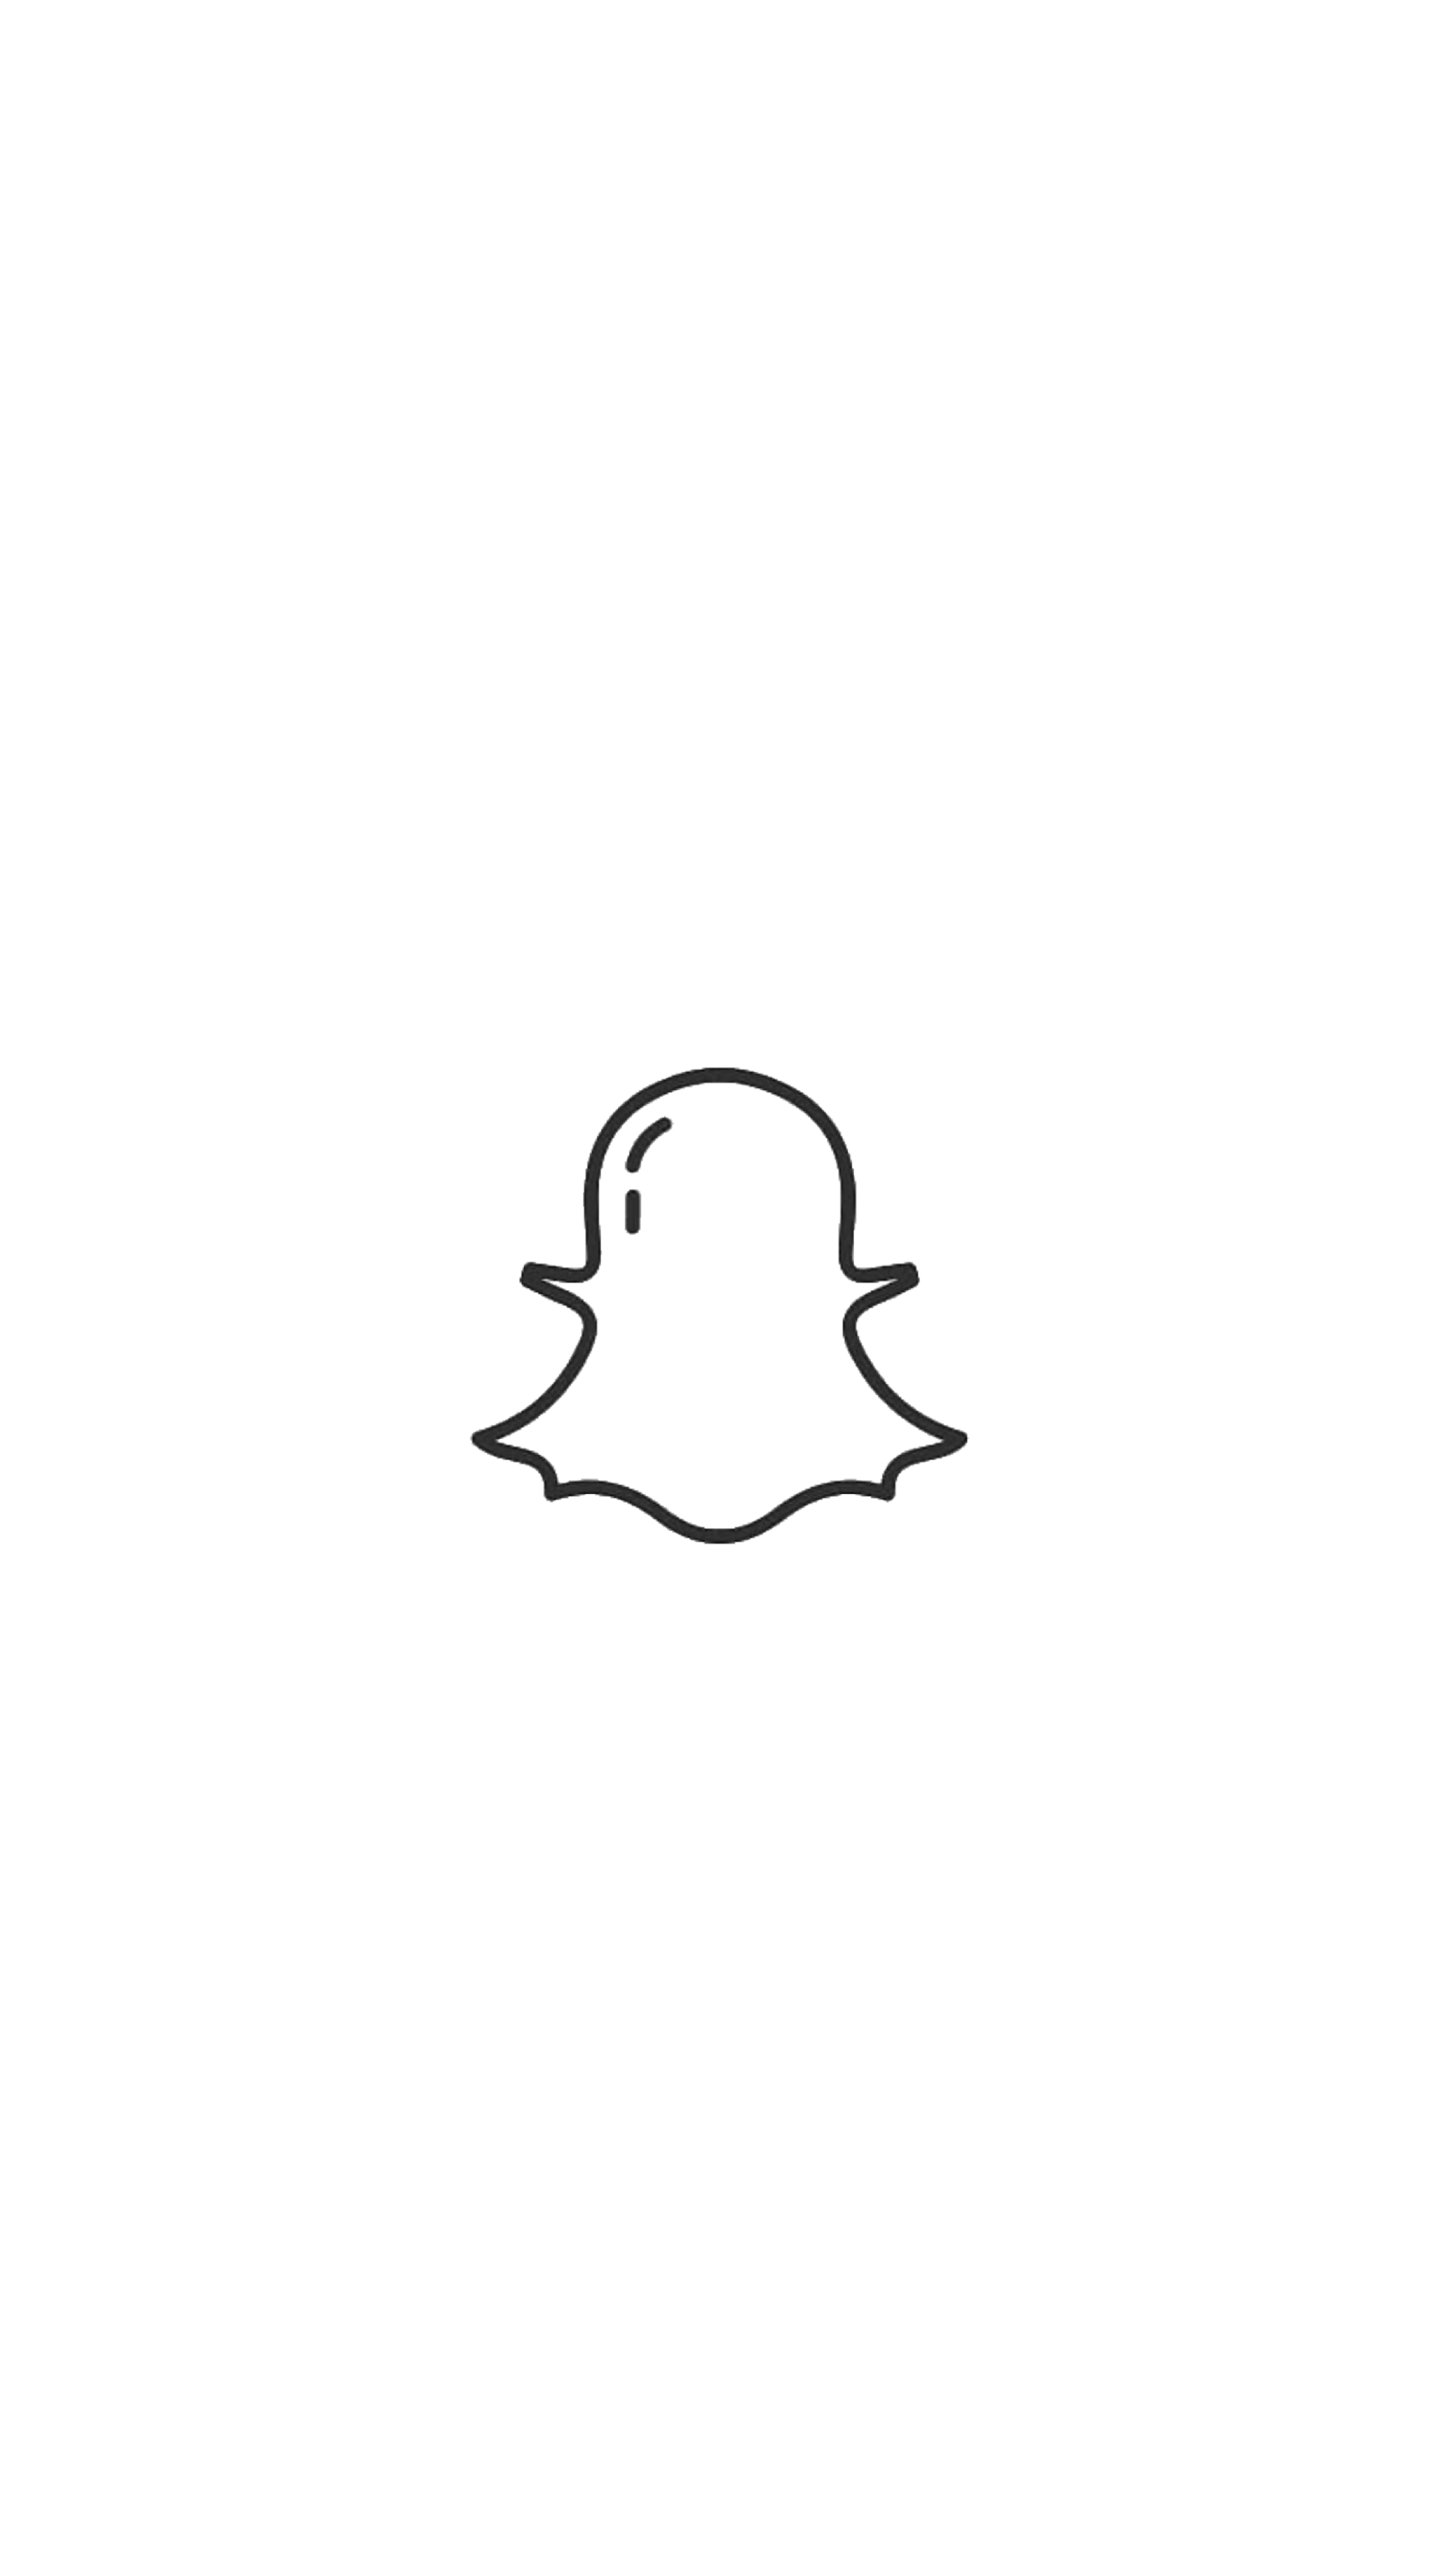 Snapchat Snapchat Icon Iphone Photo App Iphone Wallpaper Tumblr Aesthetic